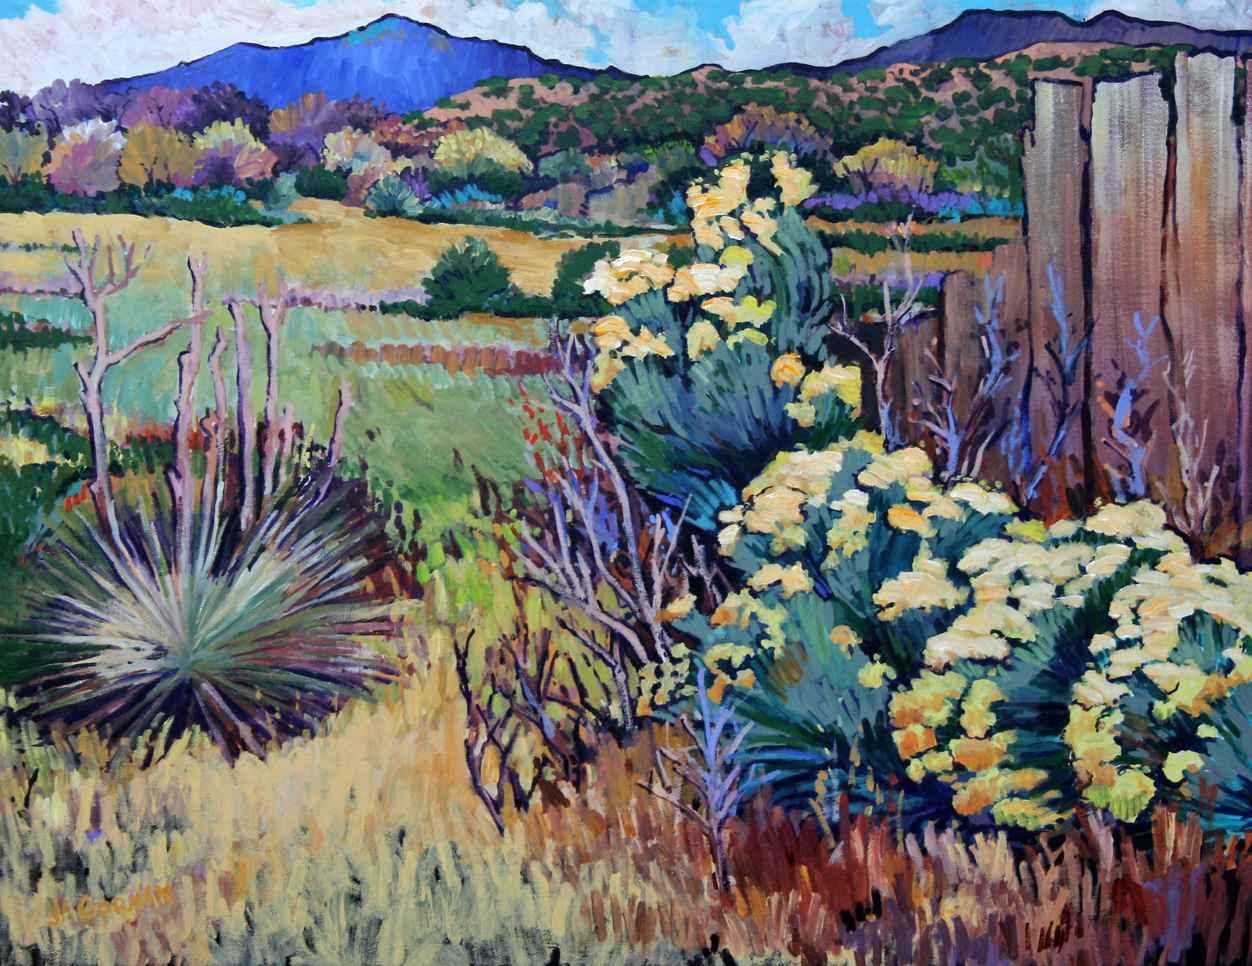 Mi Que Si Pinta by  JA Gorman - Masterpiece Online